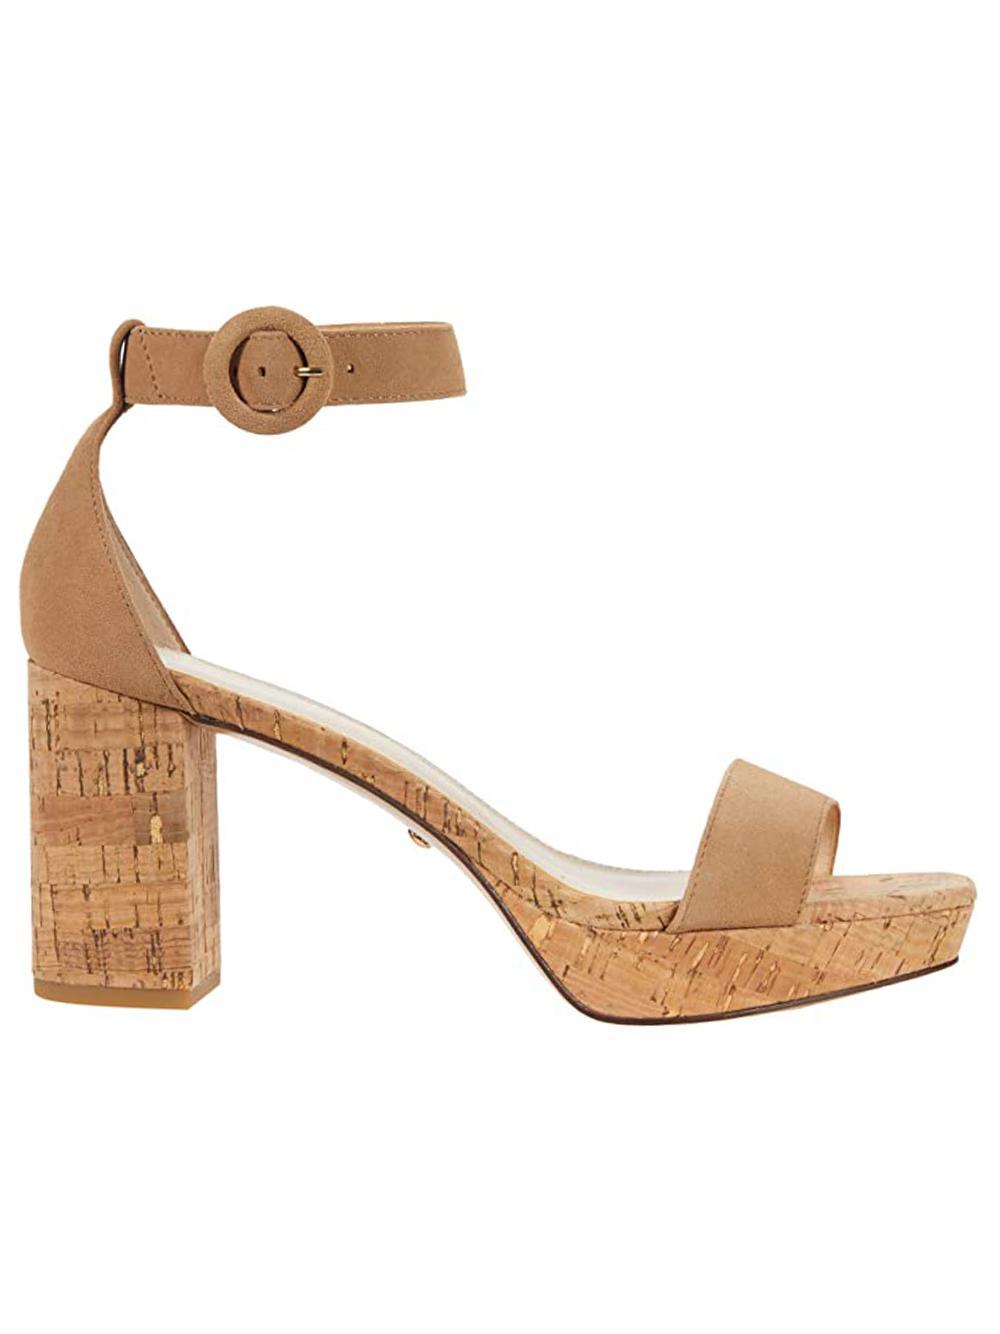 Amari Platform Cork Sandal Item # AMARI